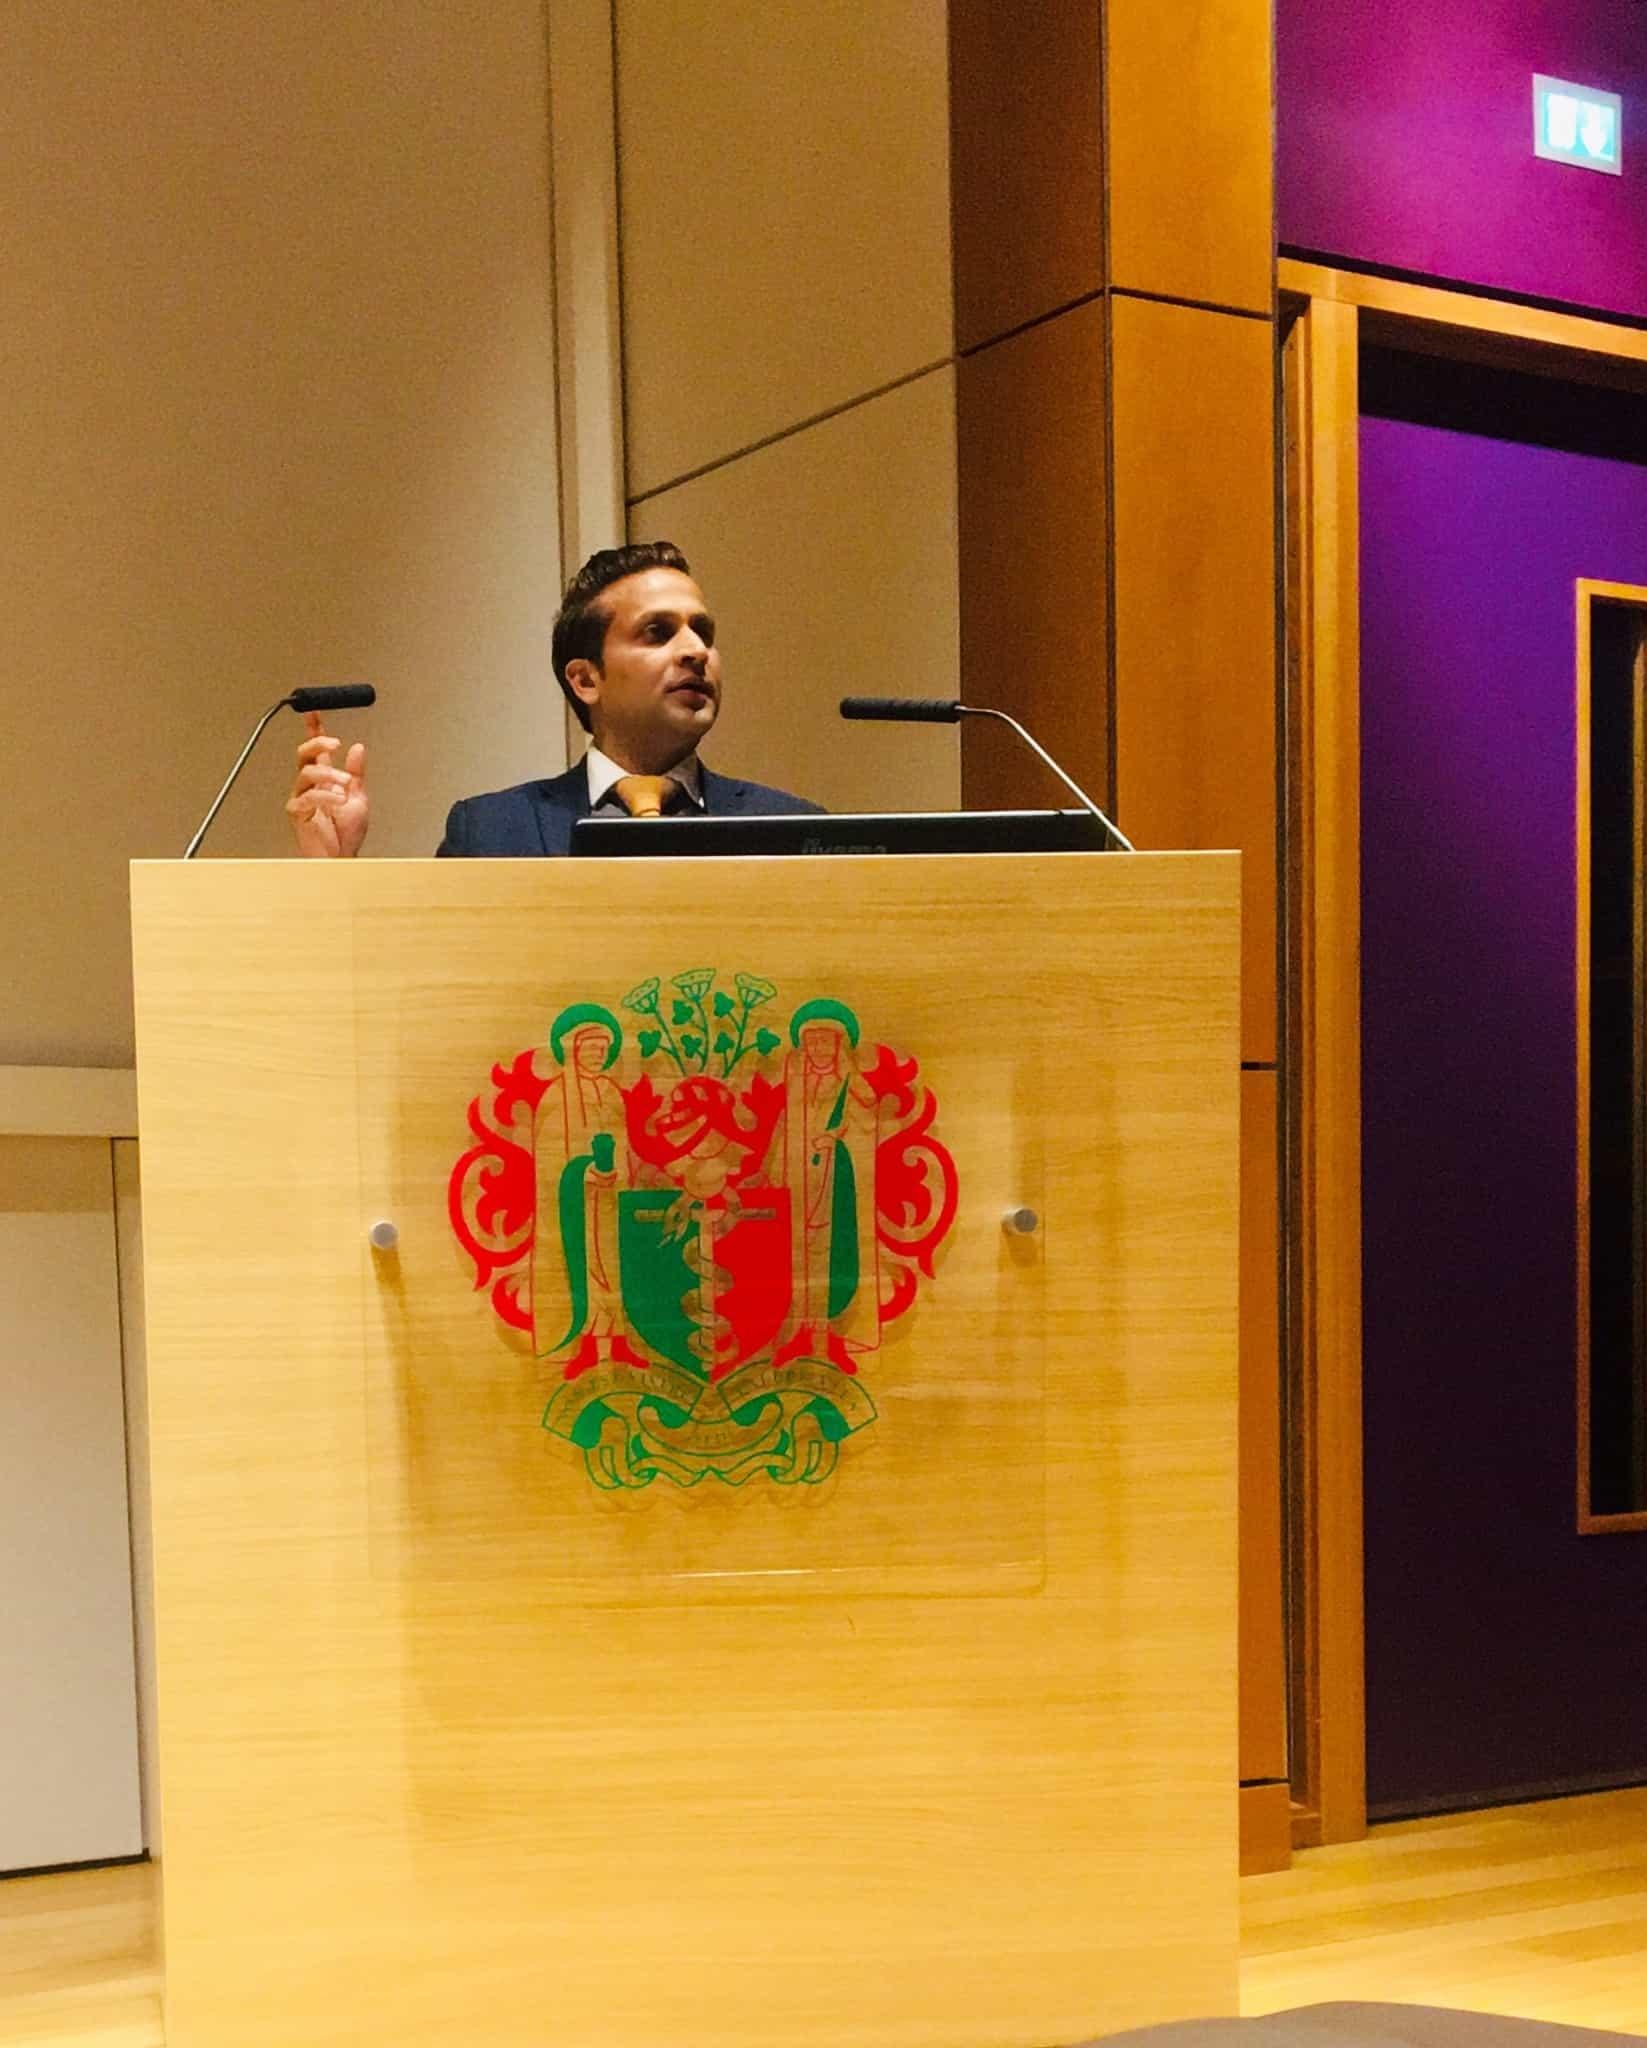 Tarak Nath Gorai delivery Change Management Keynote Speaker at Royal Society of Medicine, London